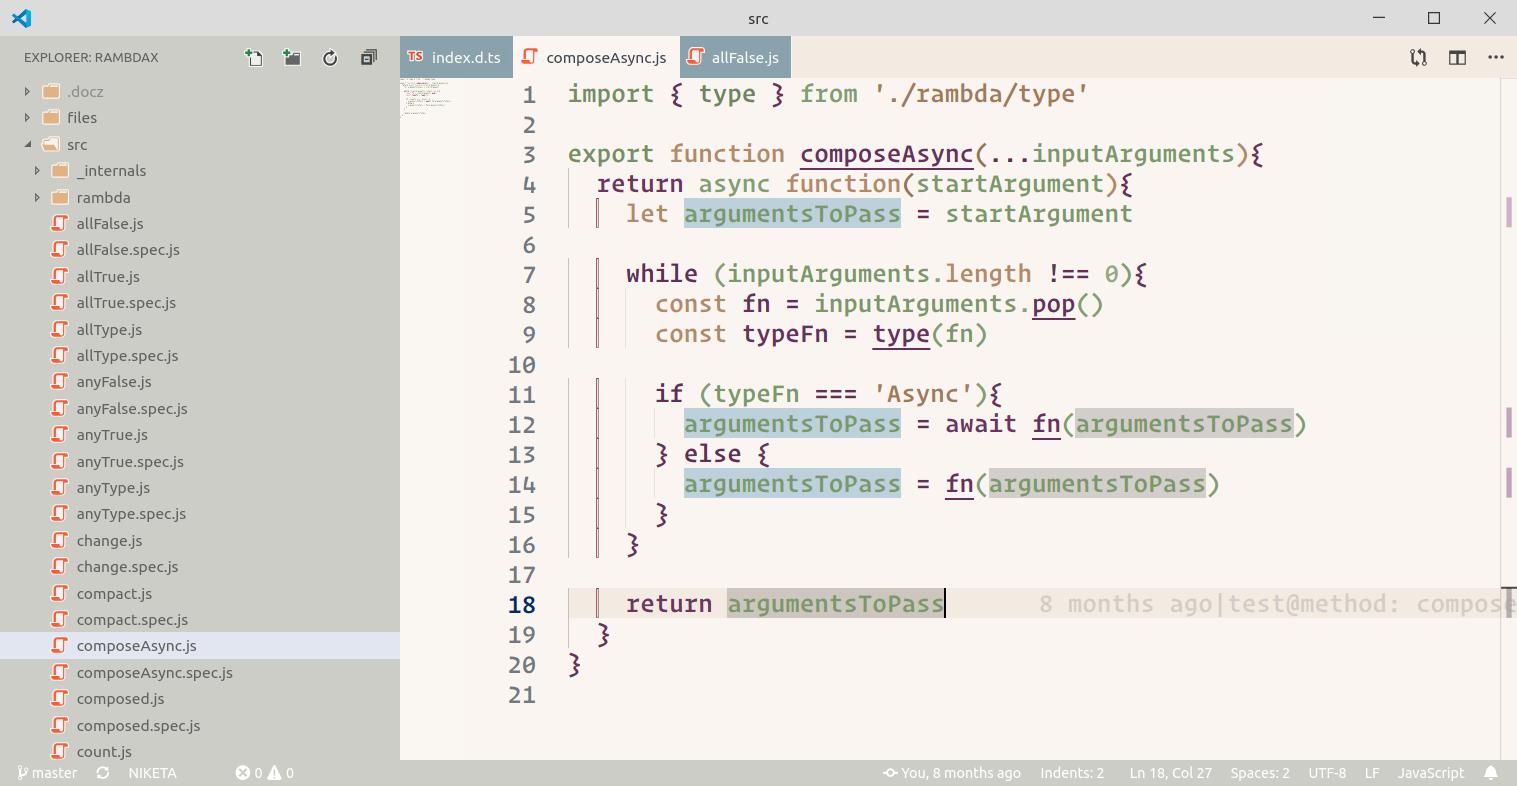 vscode screen